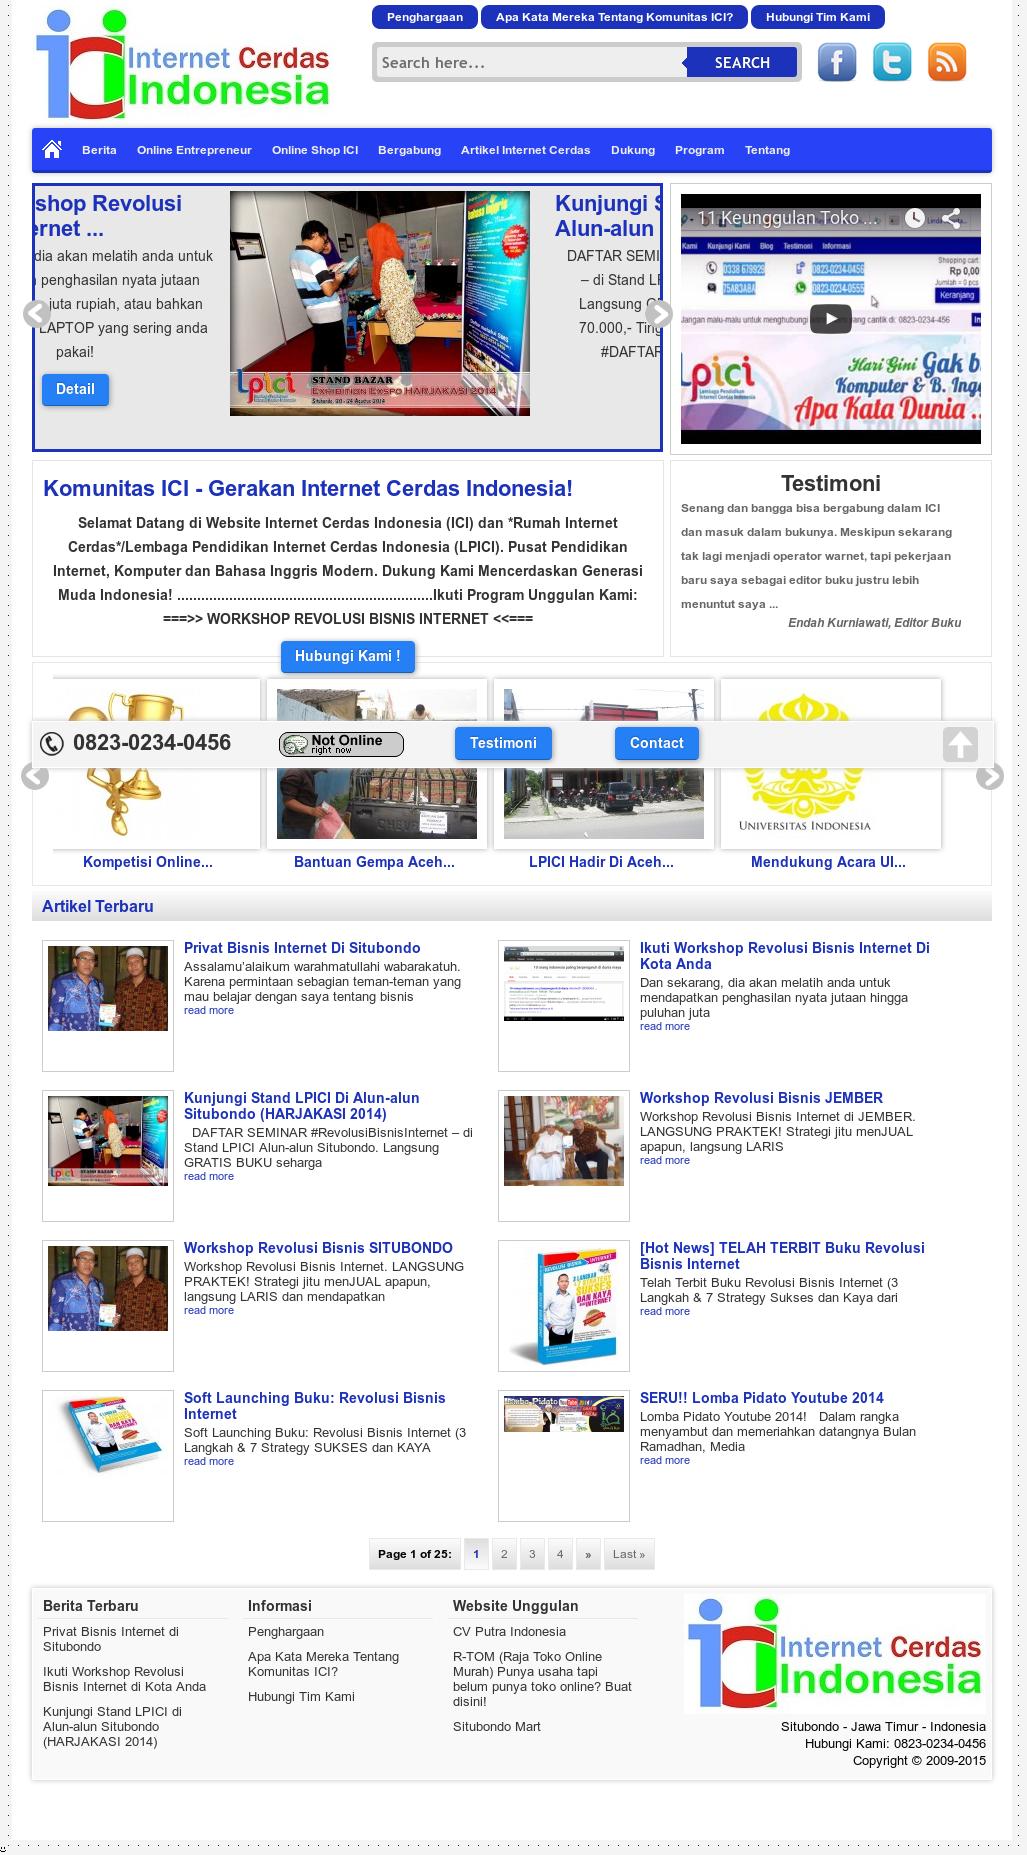 Ebook Tentang Bisnis Online